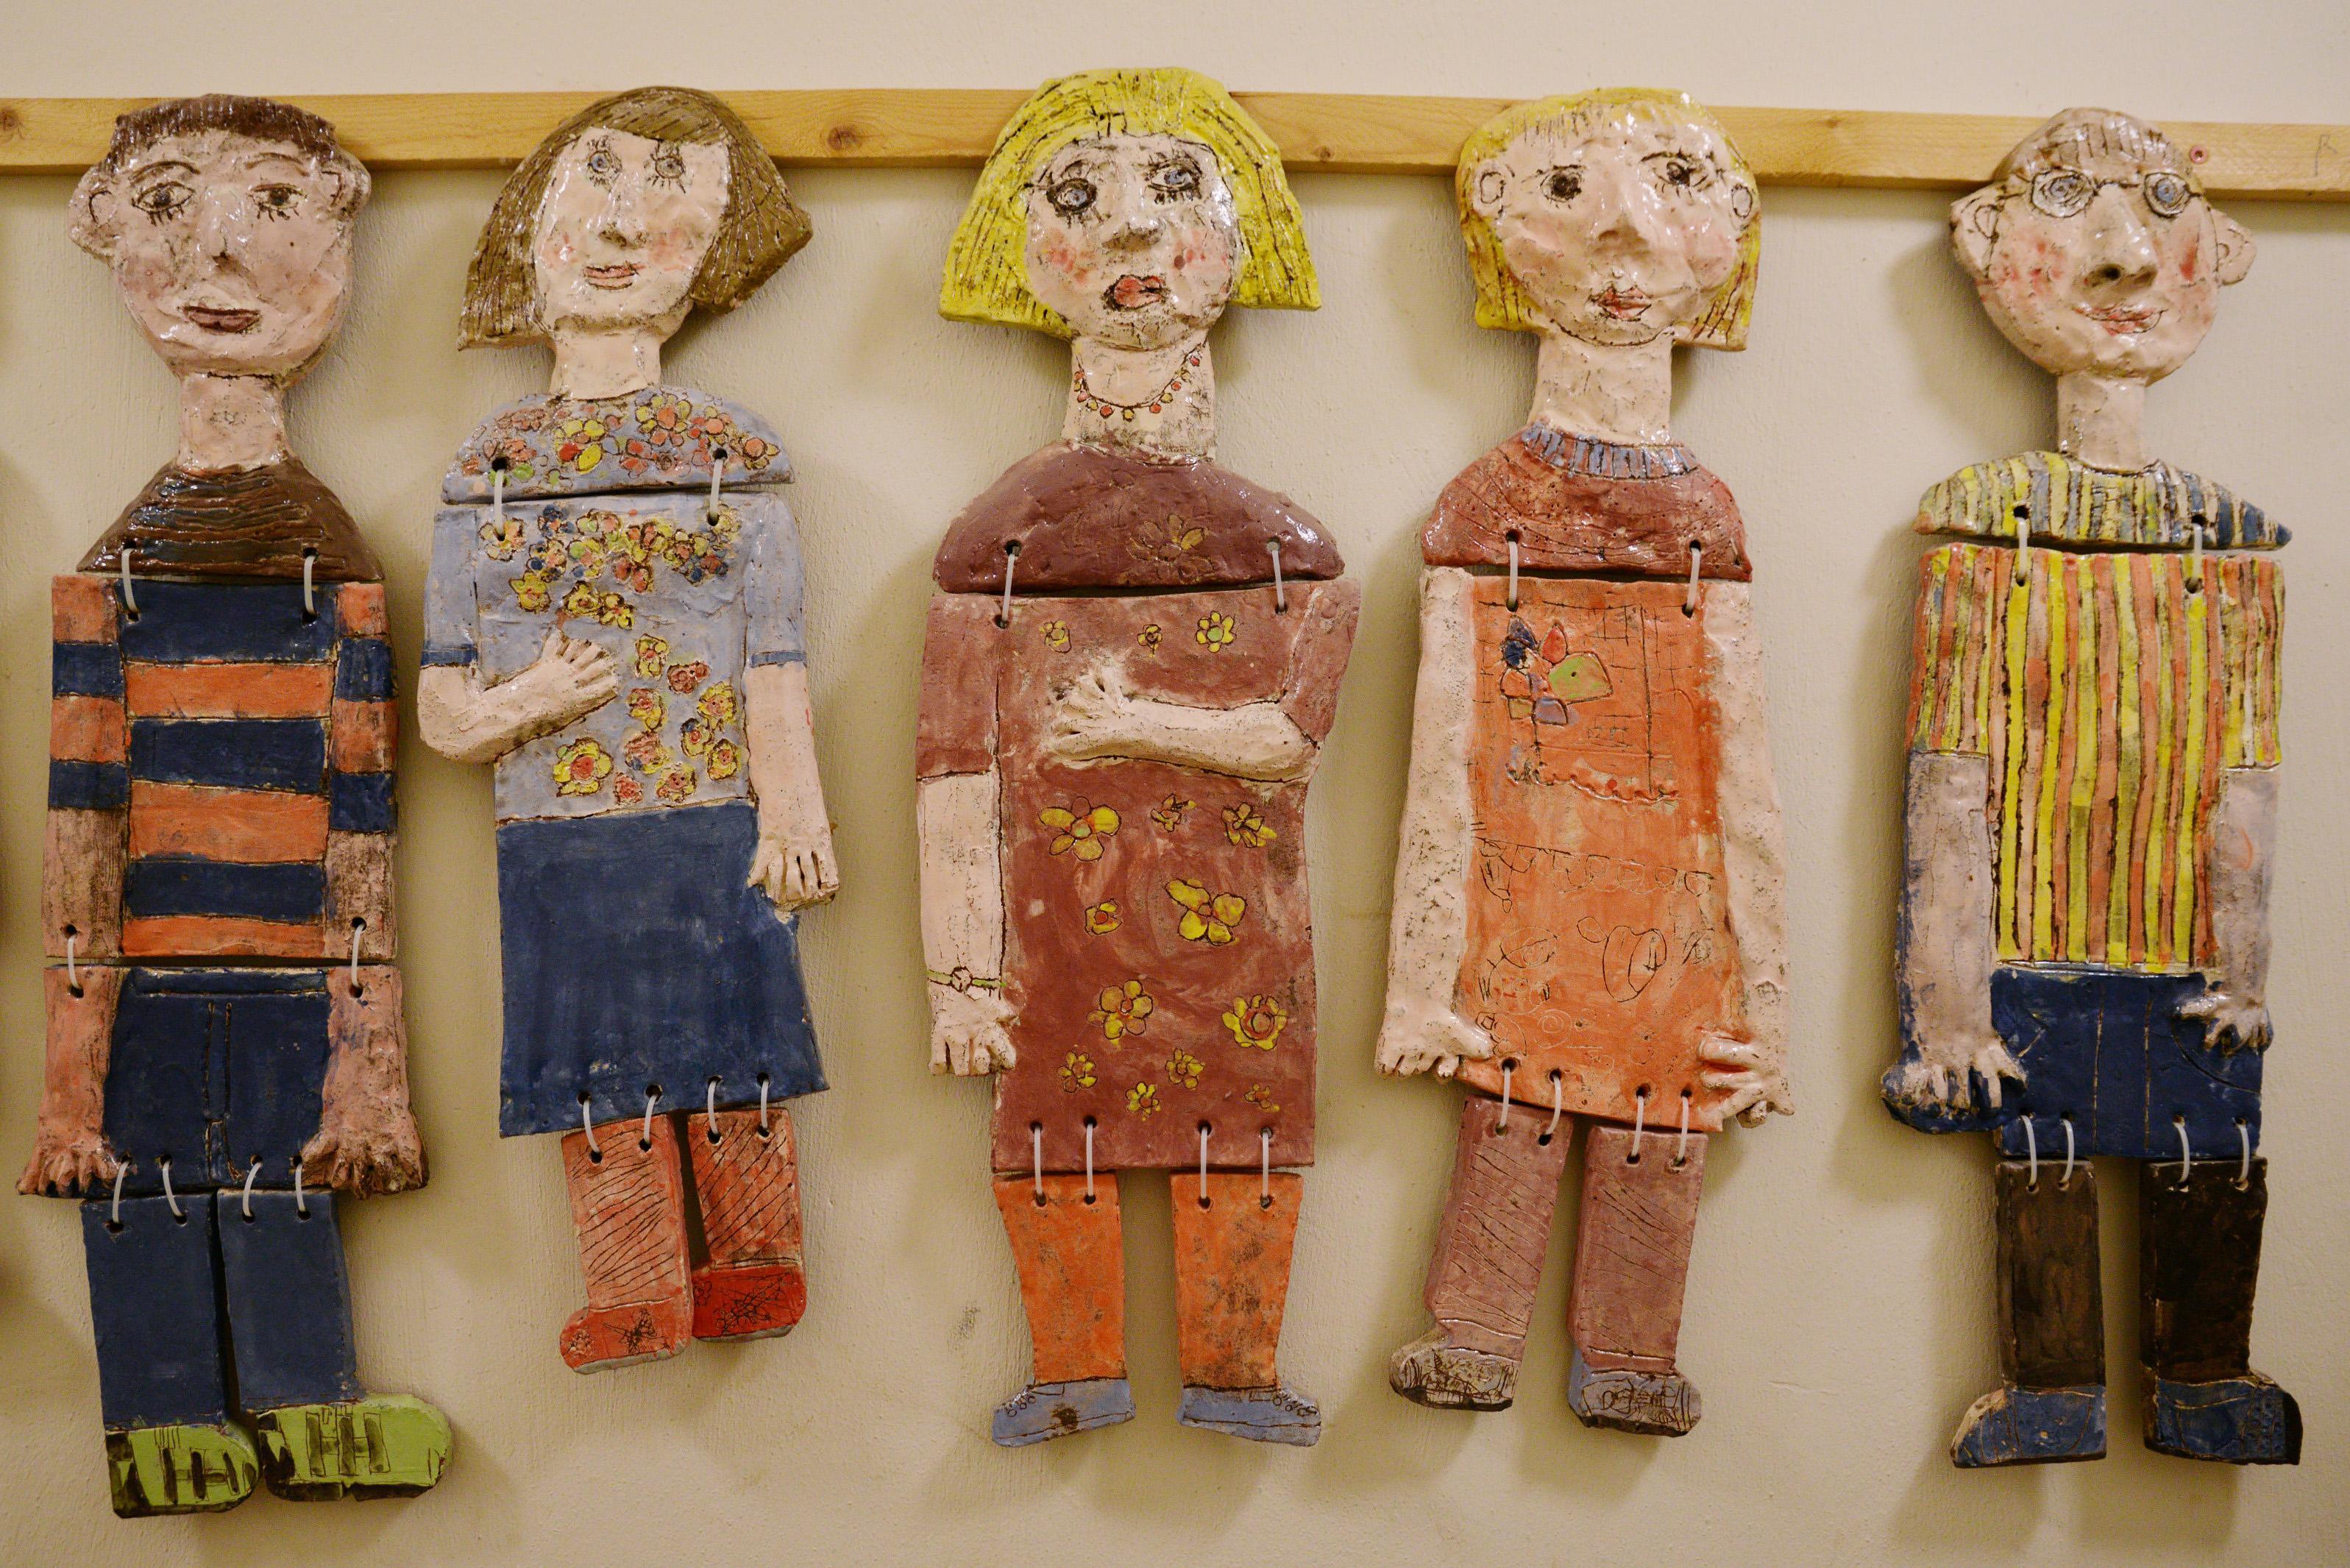 Kunstwerke der Kunstschule Wredow